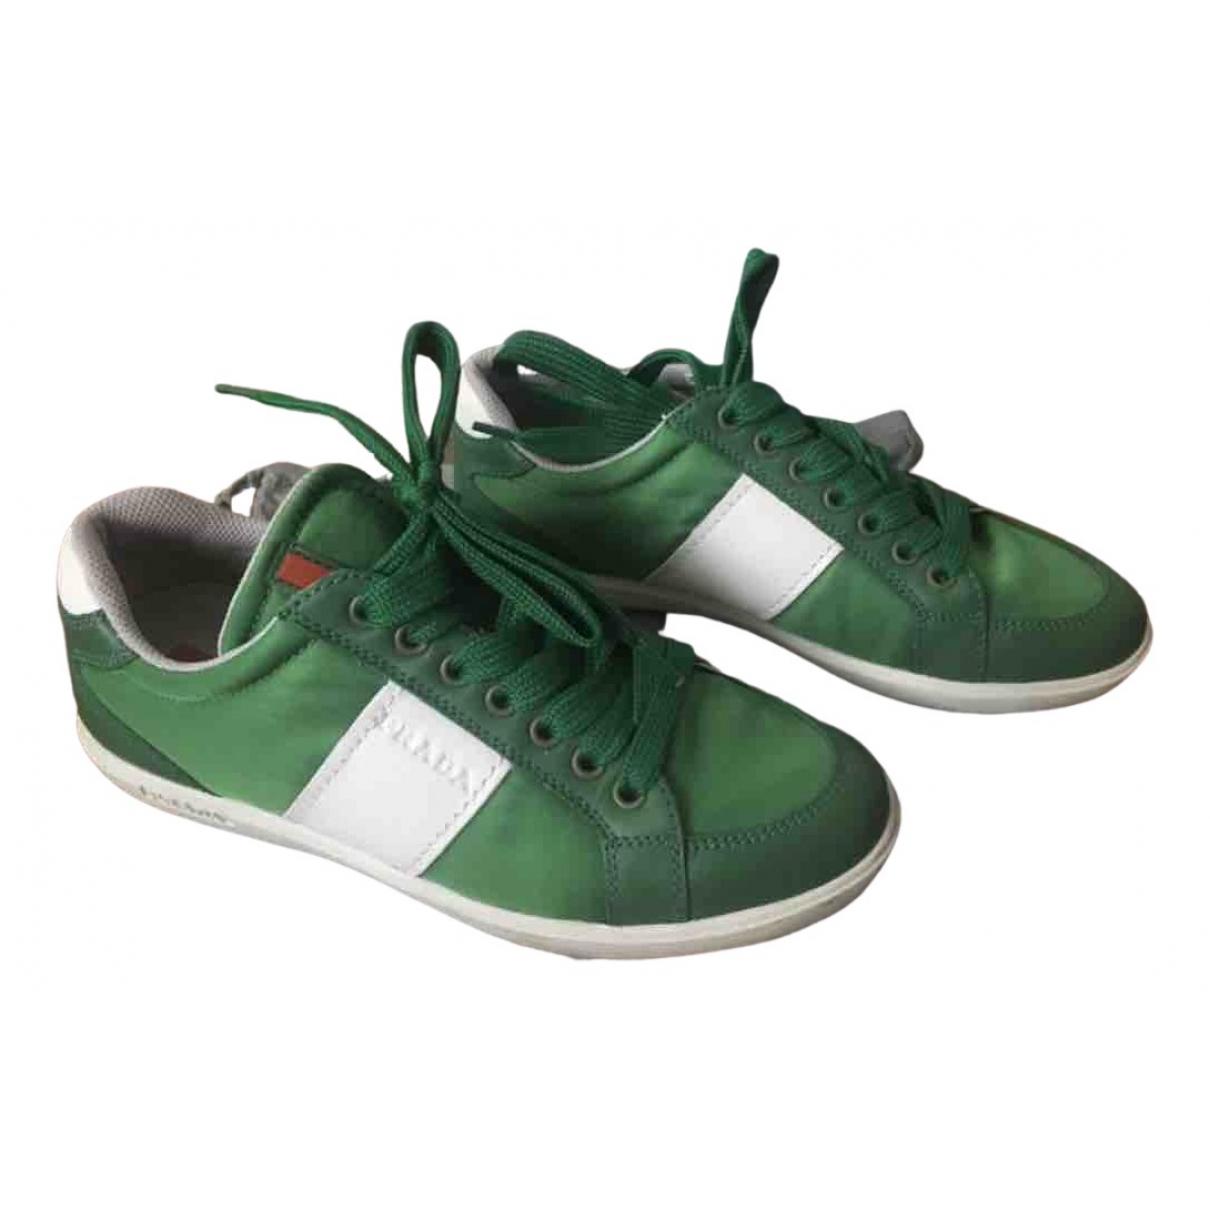 Prada \N Sneakers in  Gruen Leinen